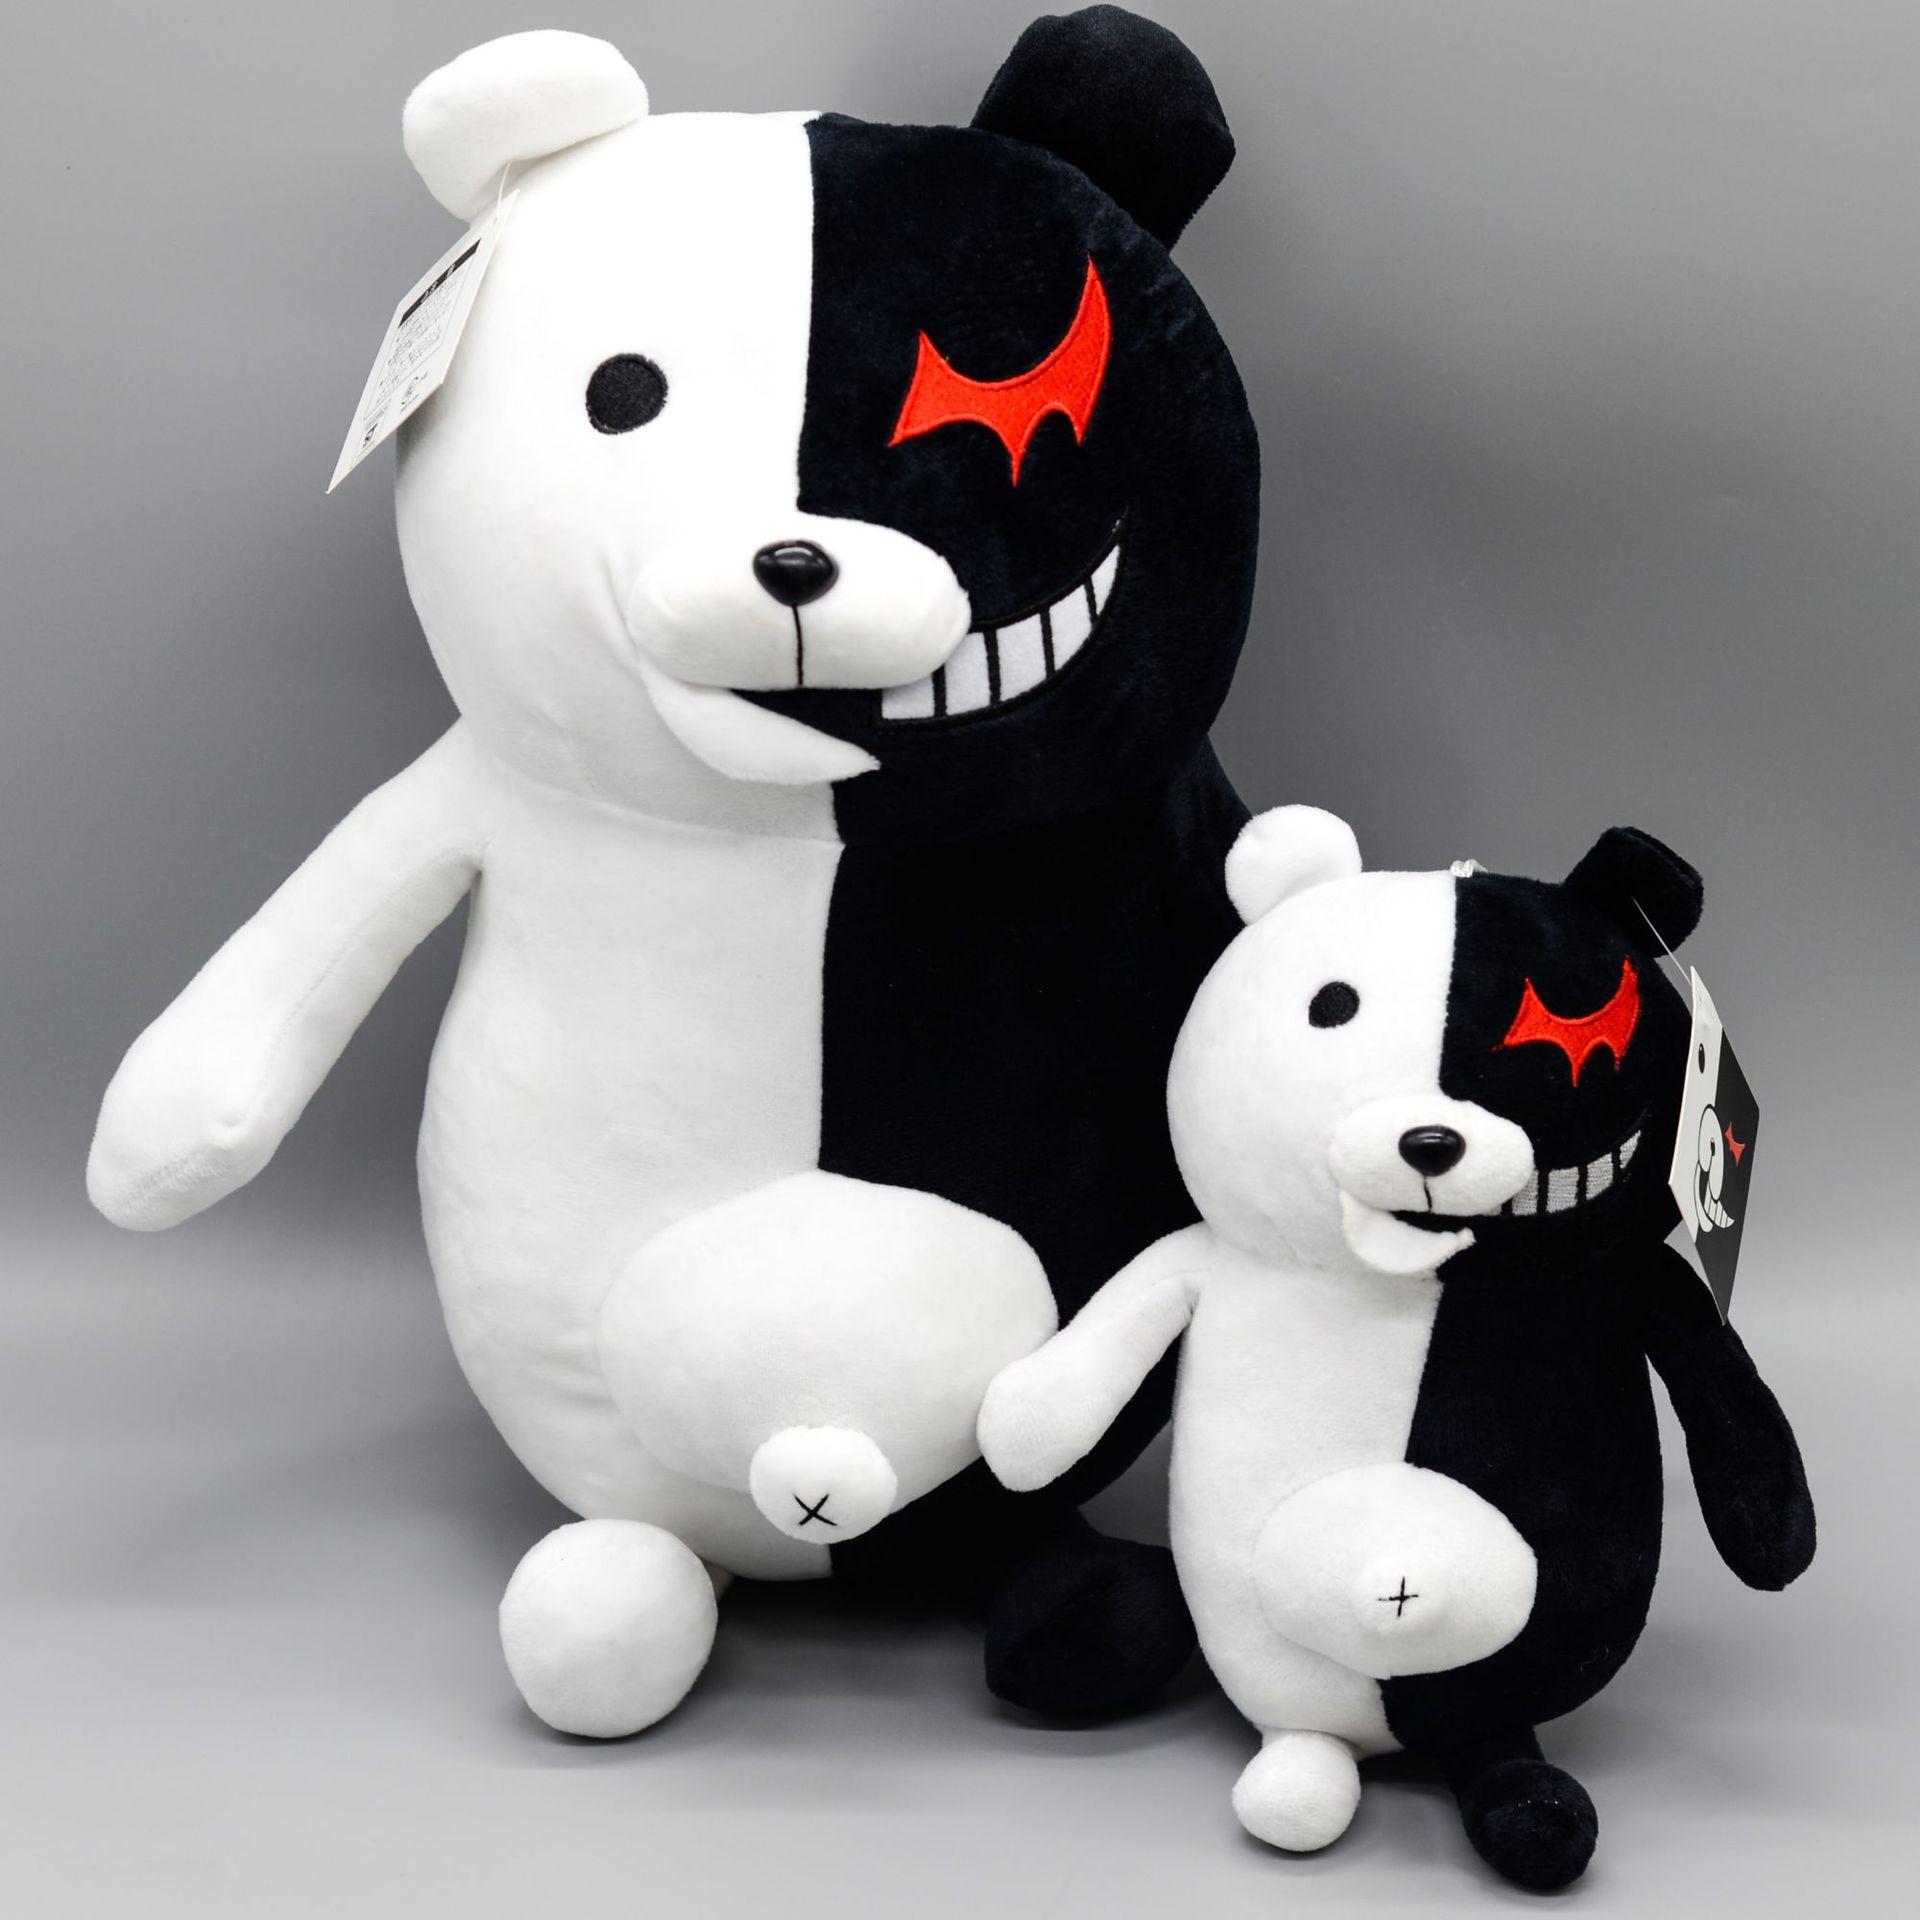 43cm/35cm Super Danganronpa 2 Monokuma blanco y negro oso de peluche Animal relleno del juguete